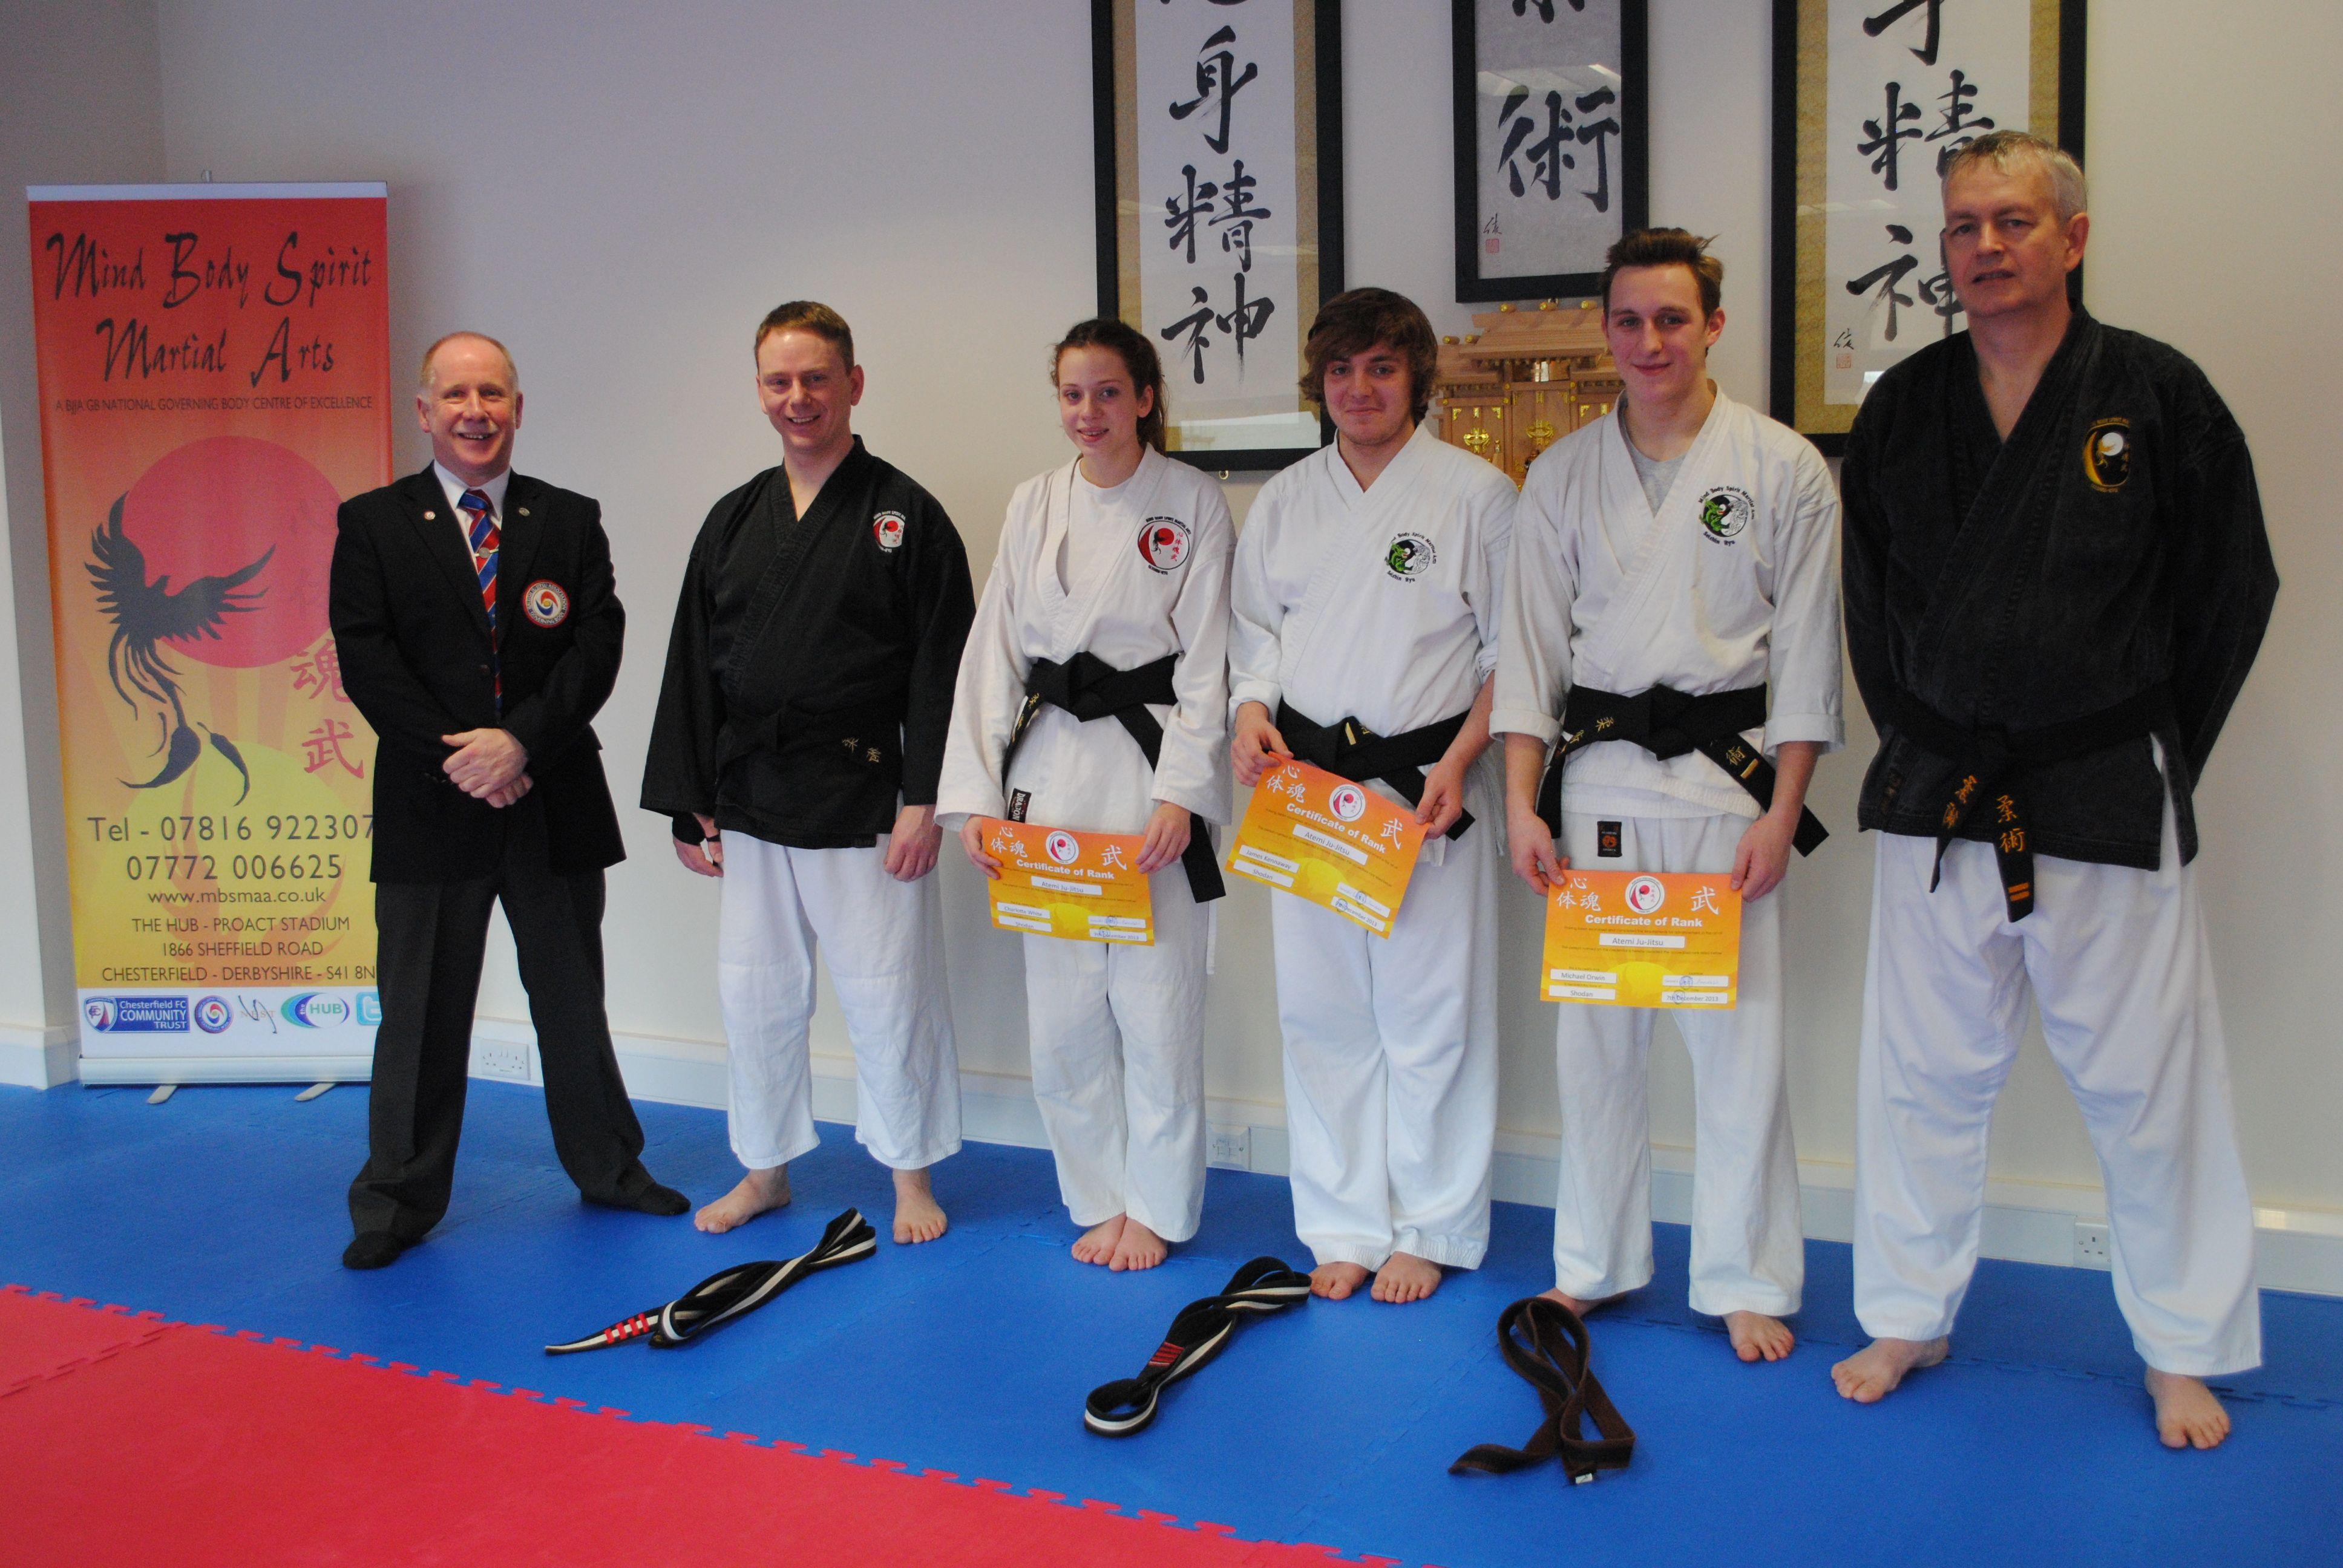 Successful 1st Dan S And Uke S Mind Body Spirit Martial